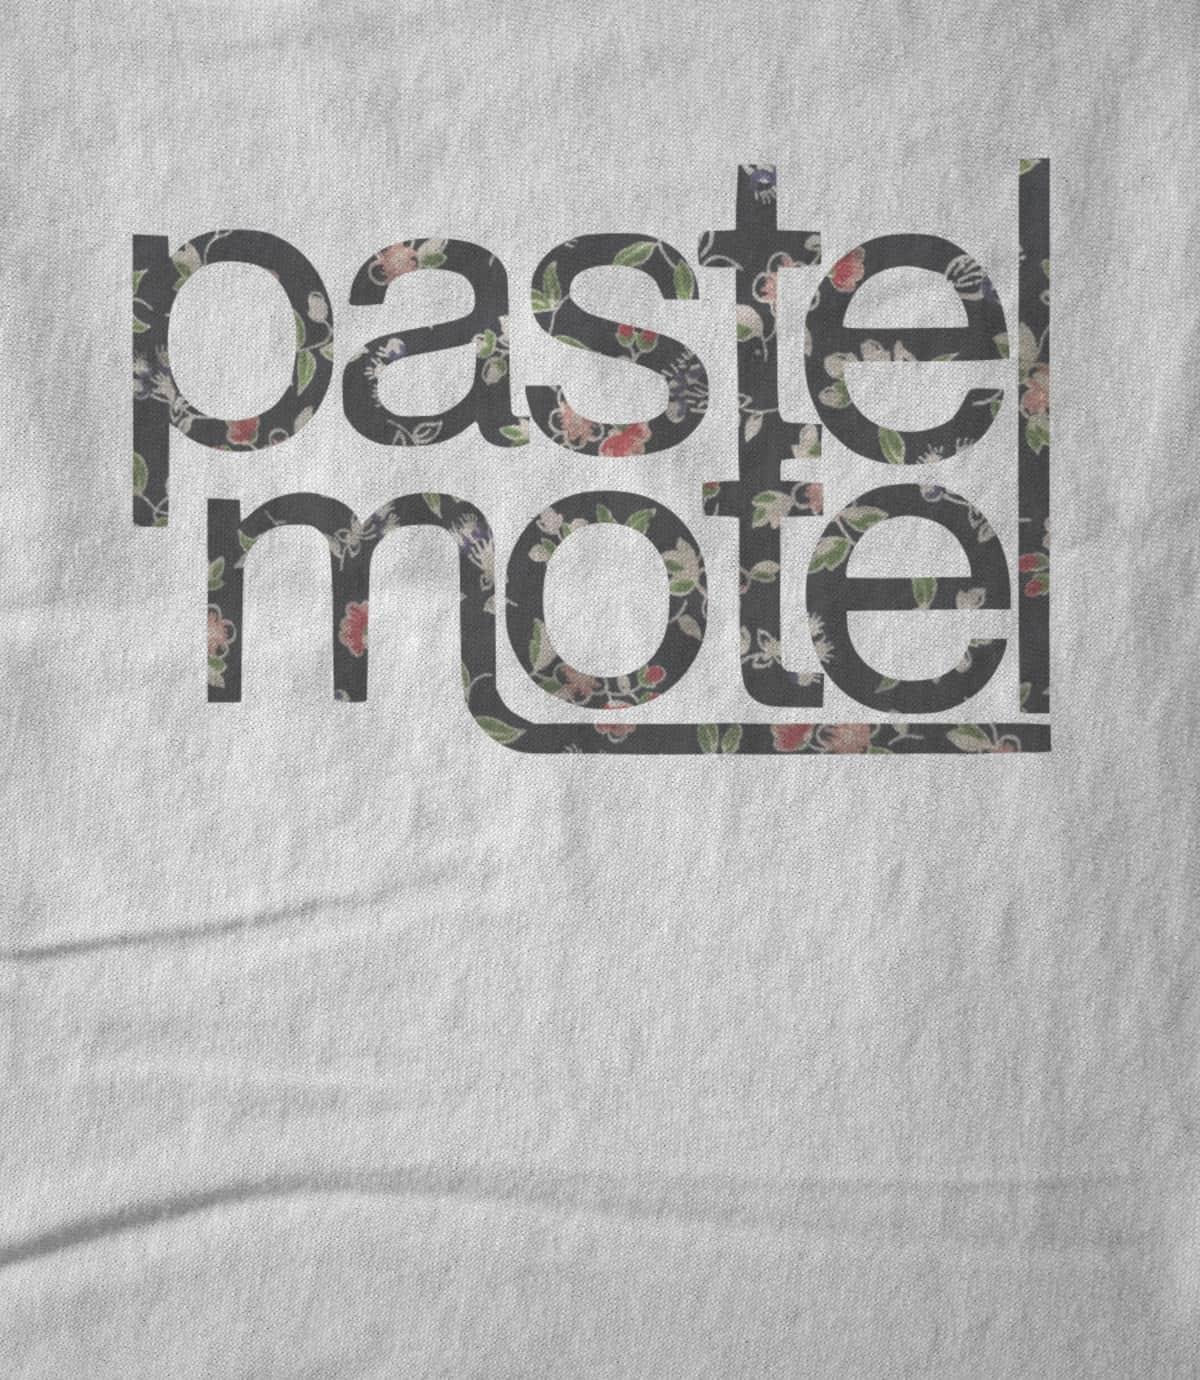 Pastel Motel